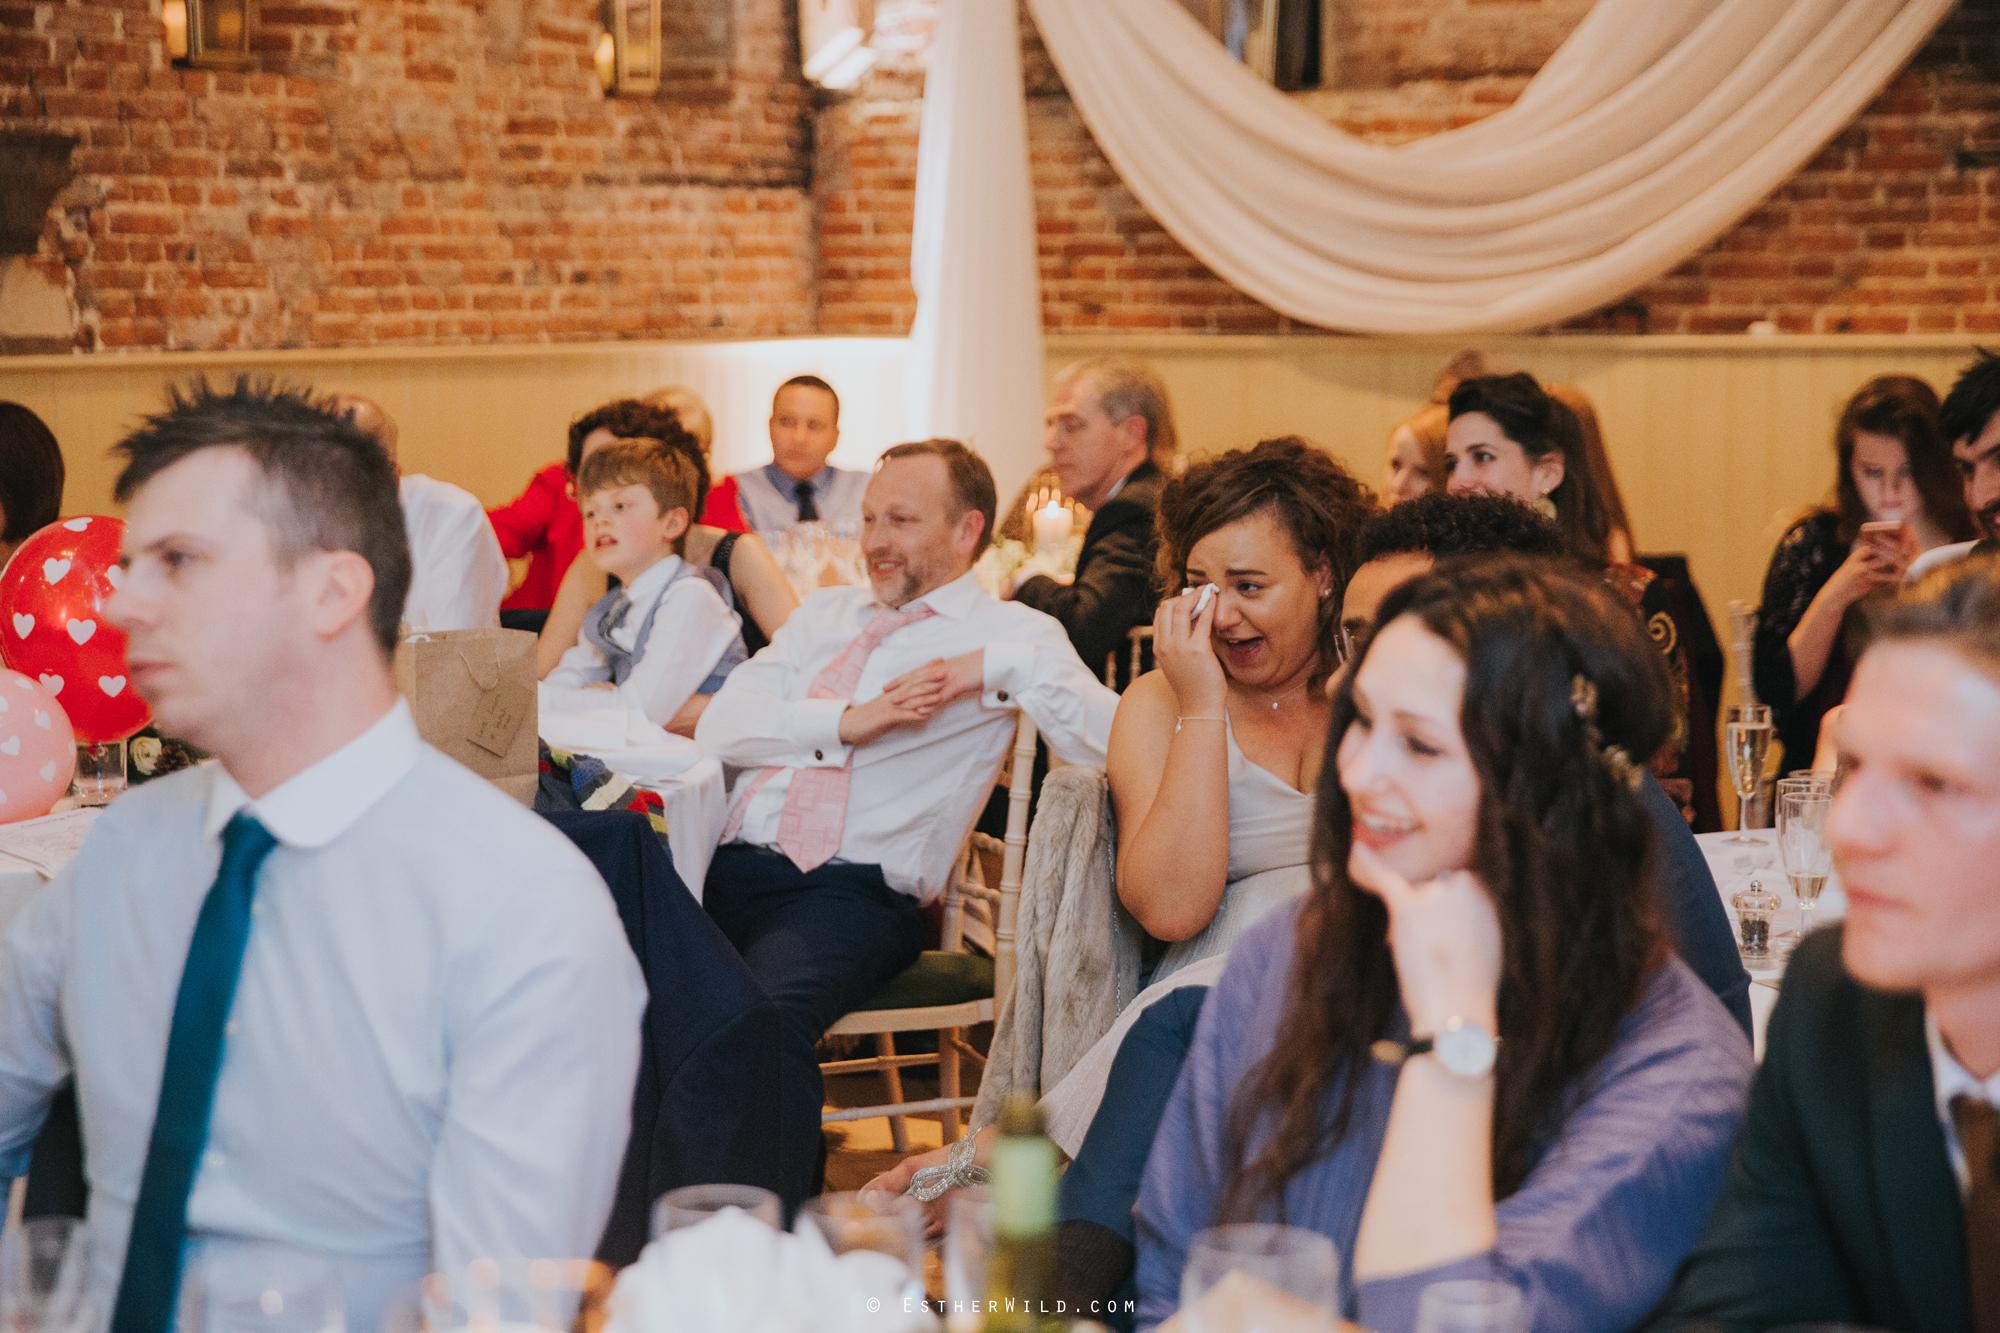 Elms_Barn_Weddings_Suffolk_Photographer_Copyright_Esther_Wild_IMG_2894.jpg